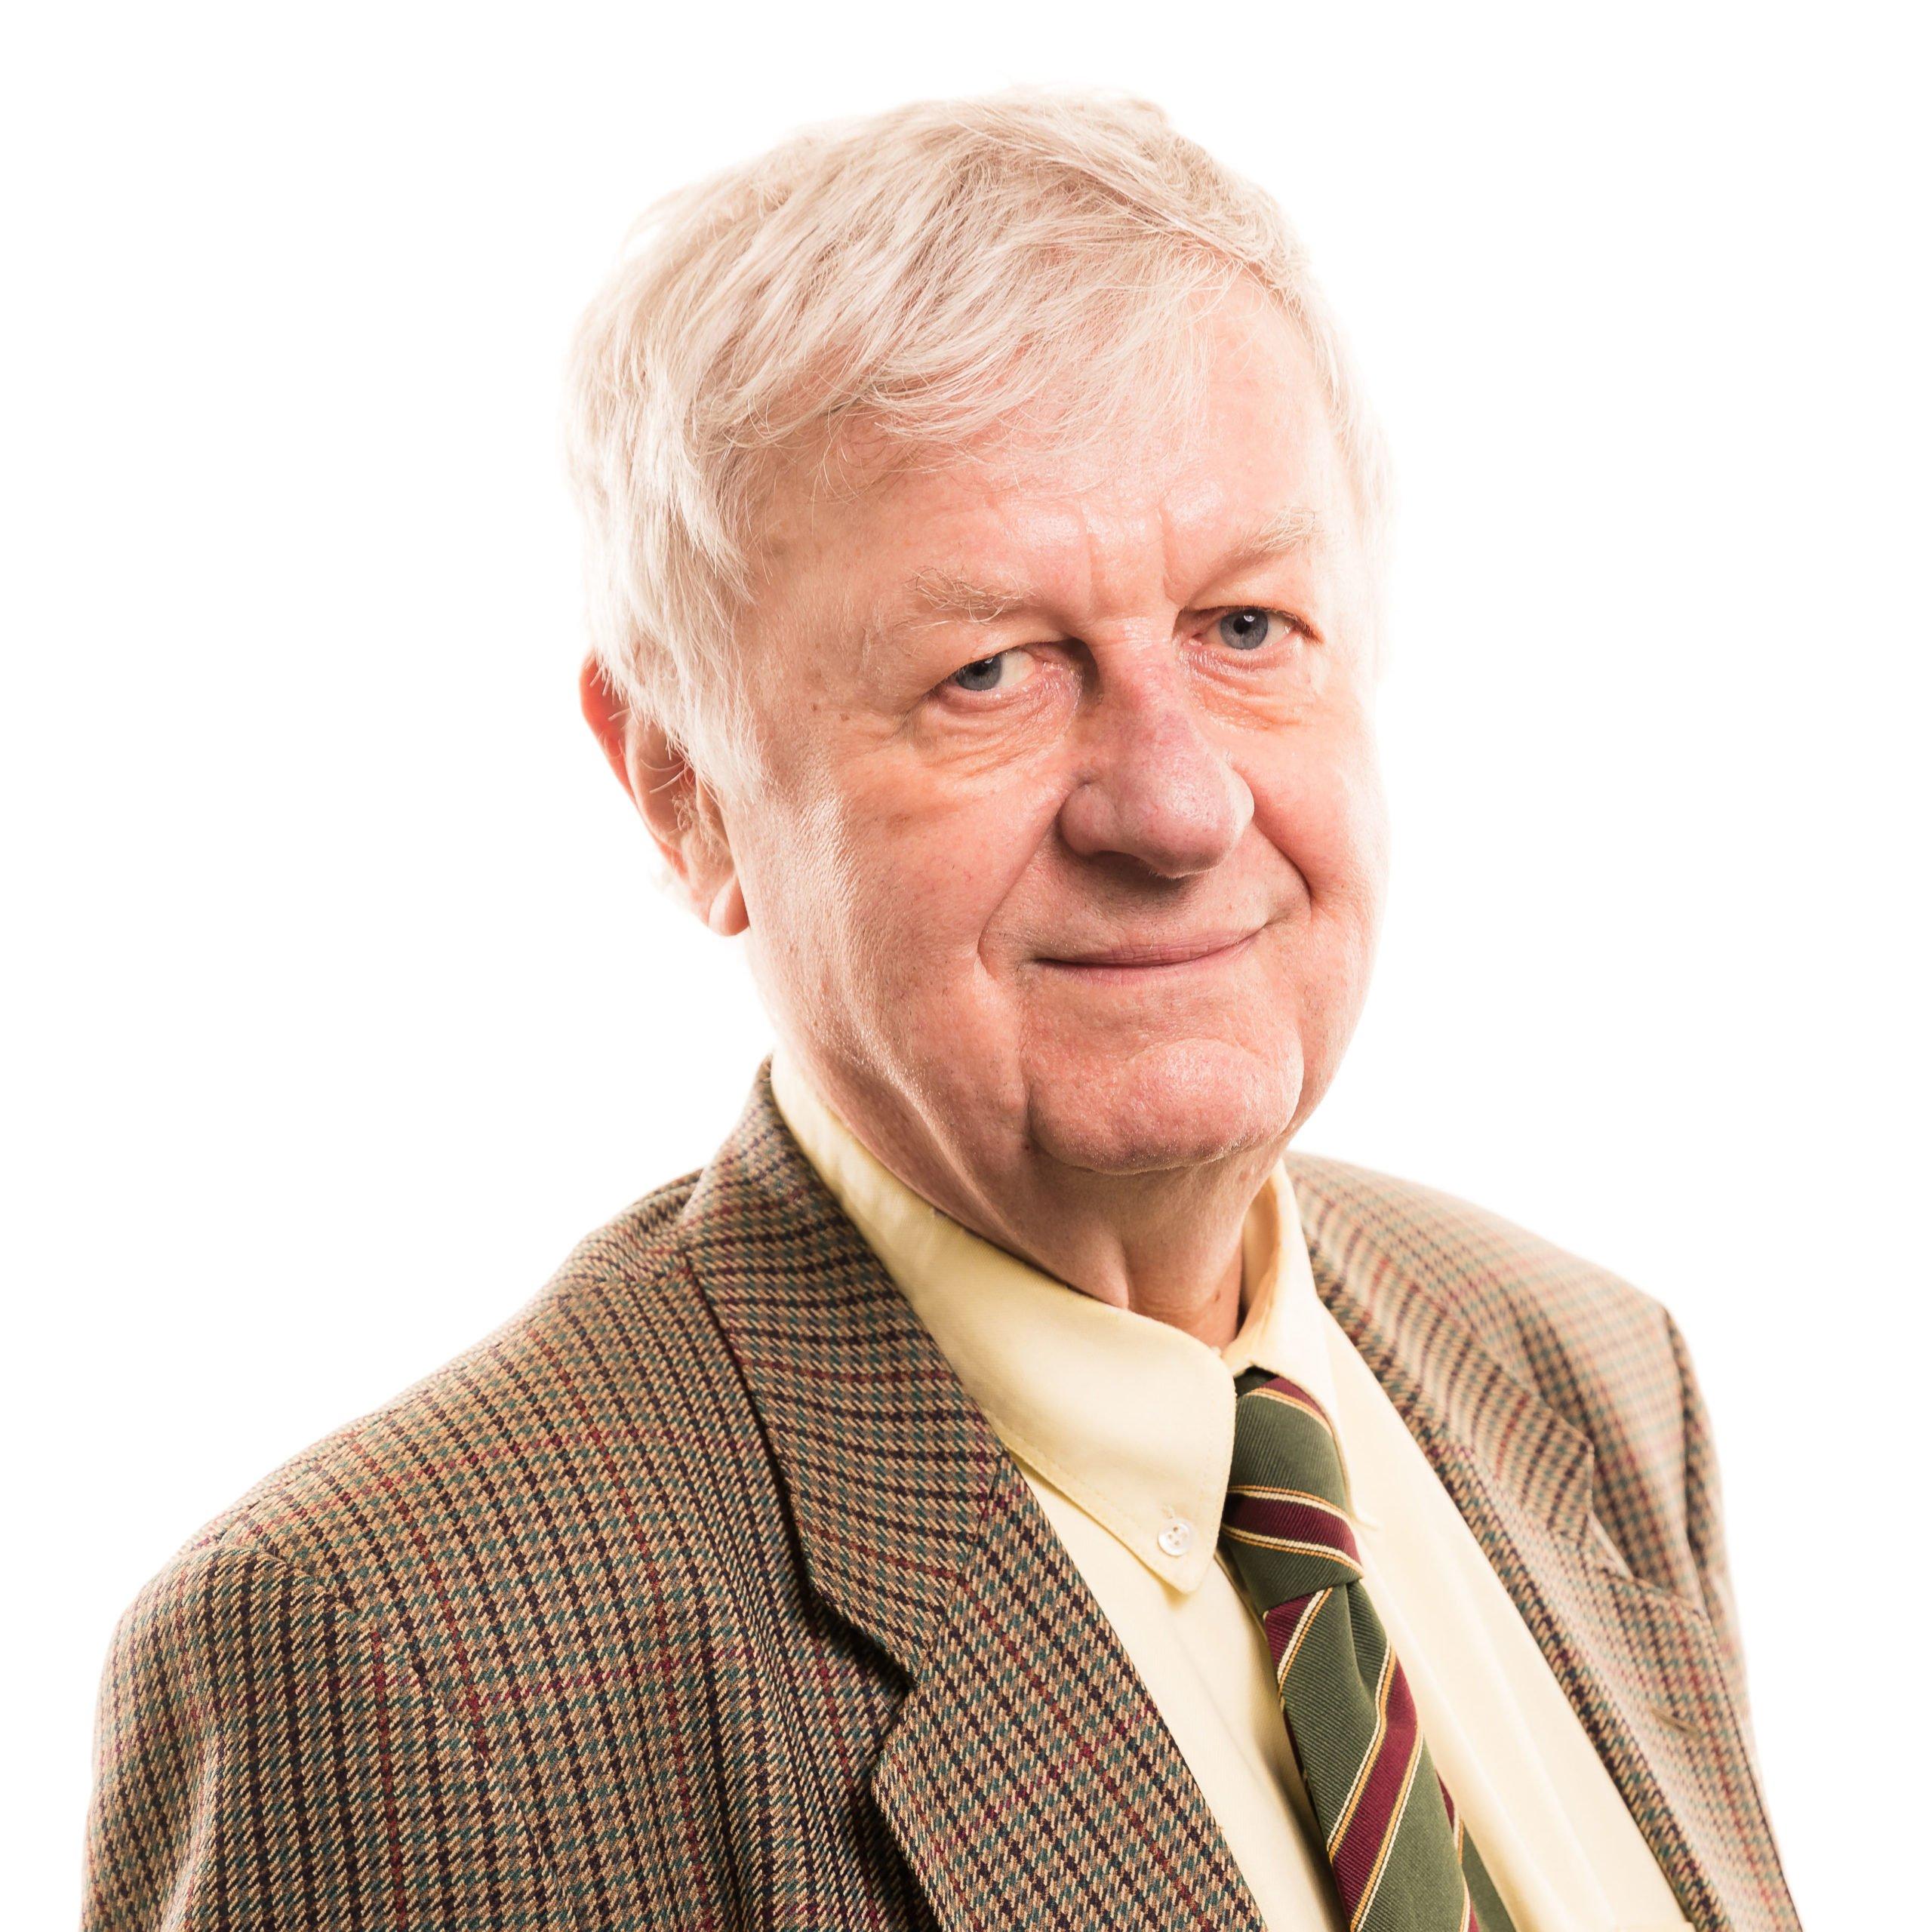 Ambassador Marc Otte